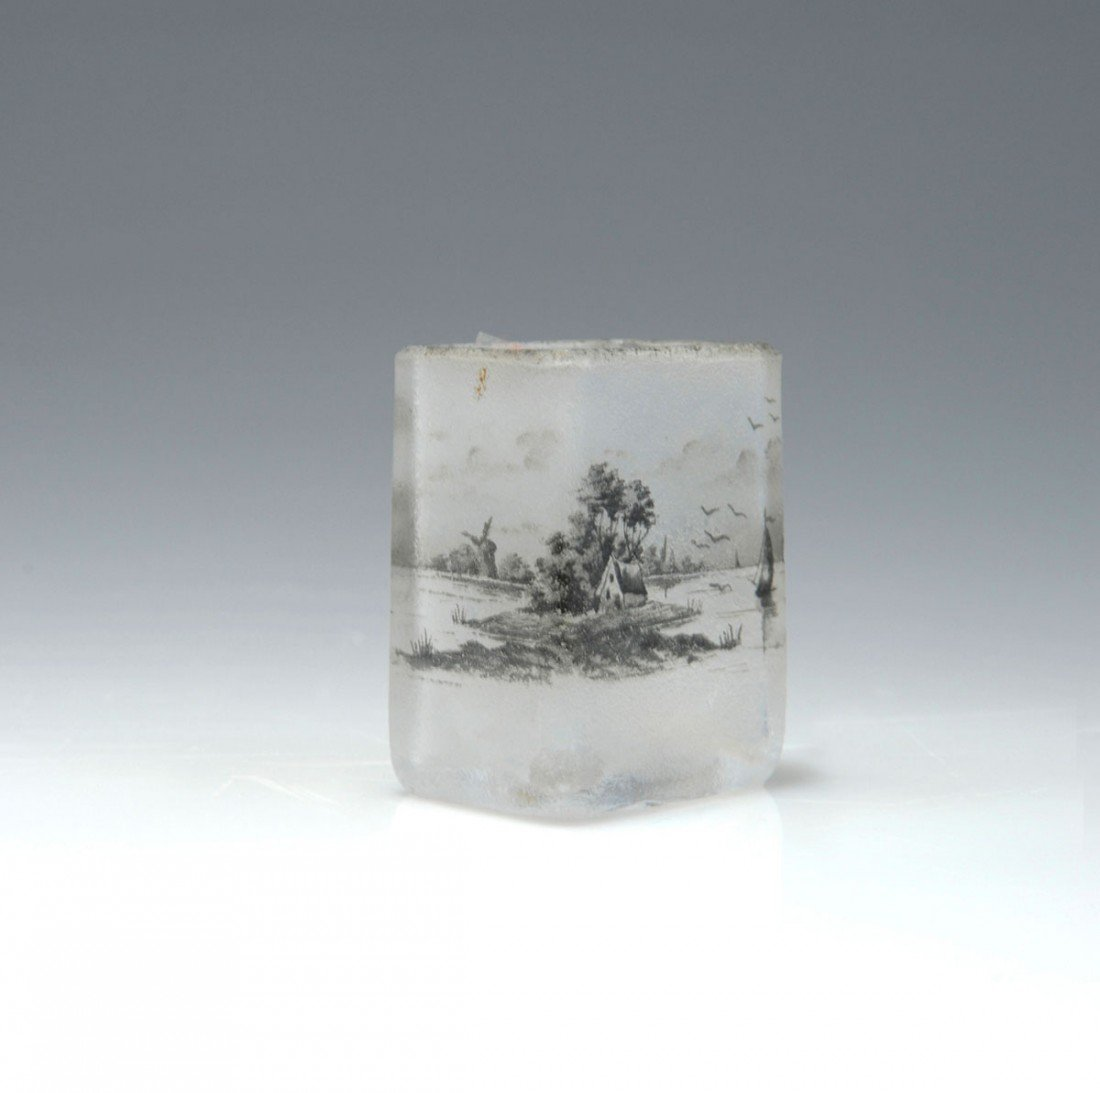 12: Miniaturvase 'Delft', 1899